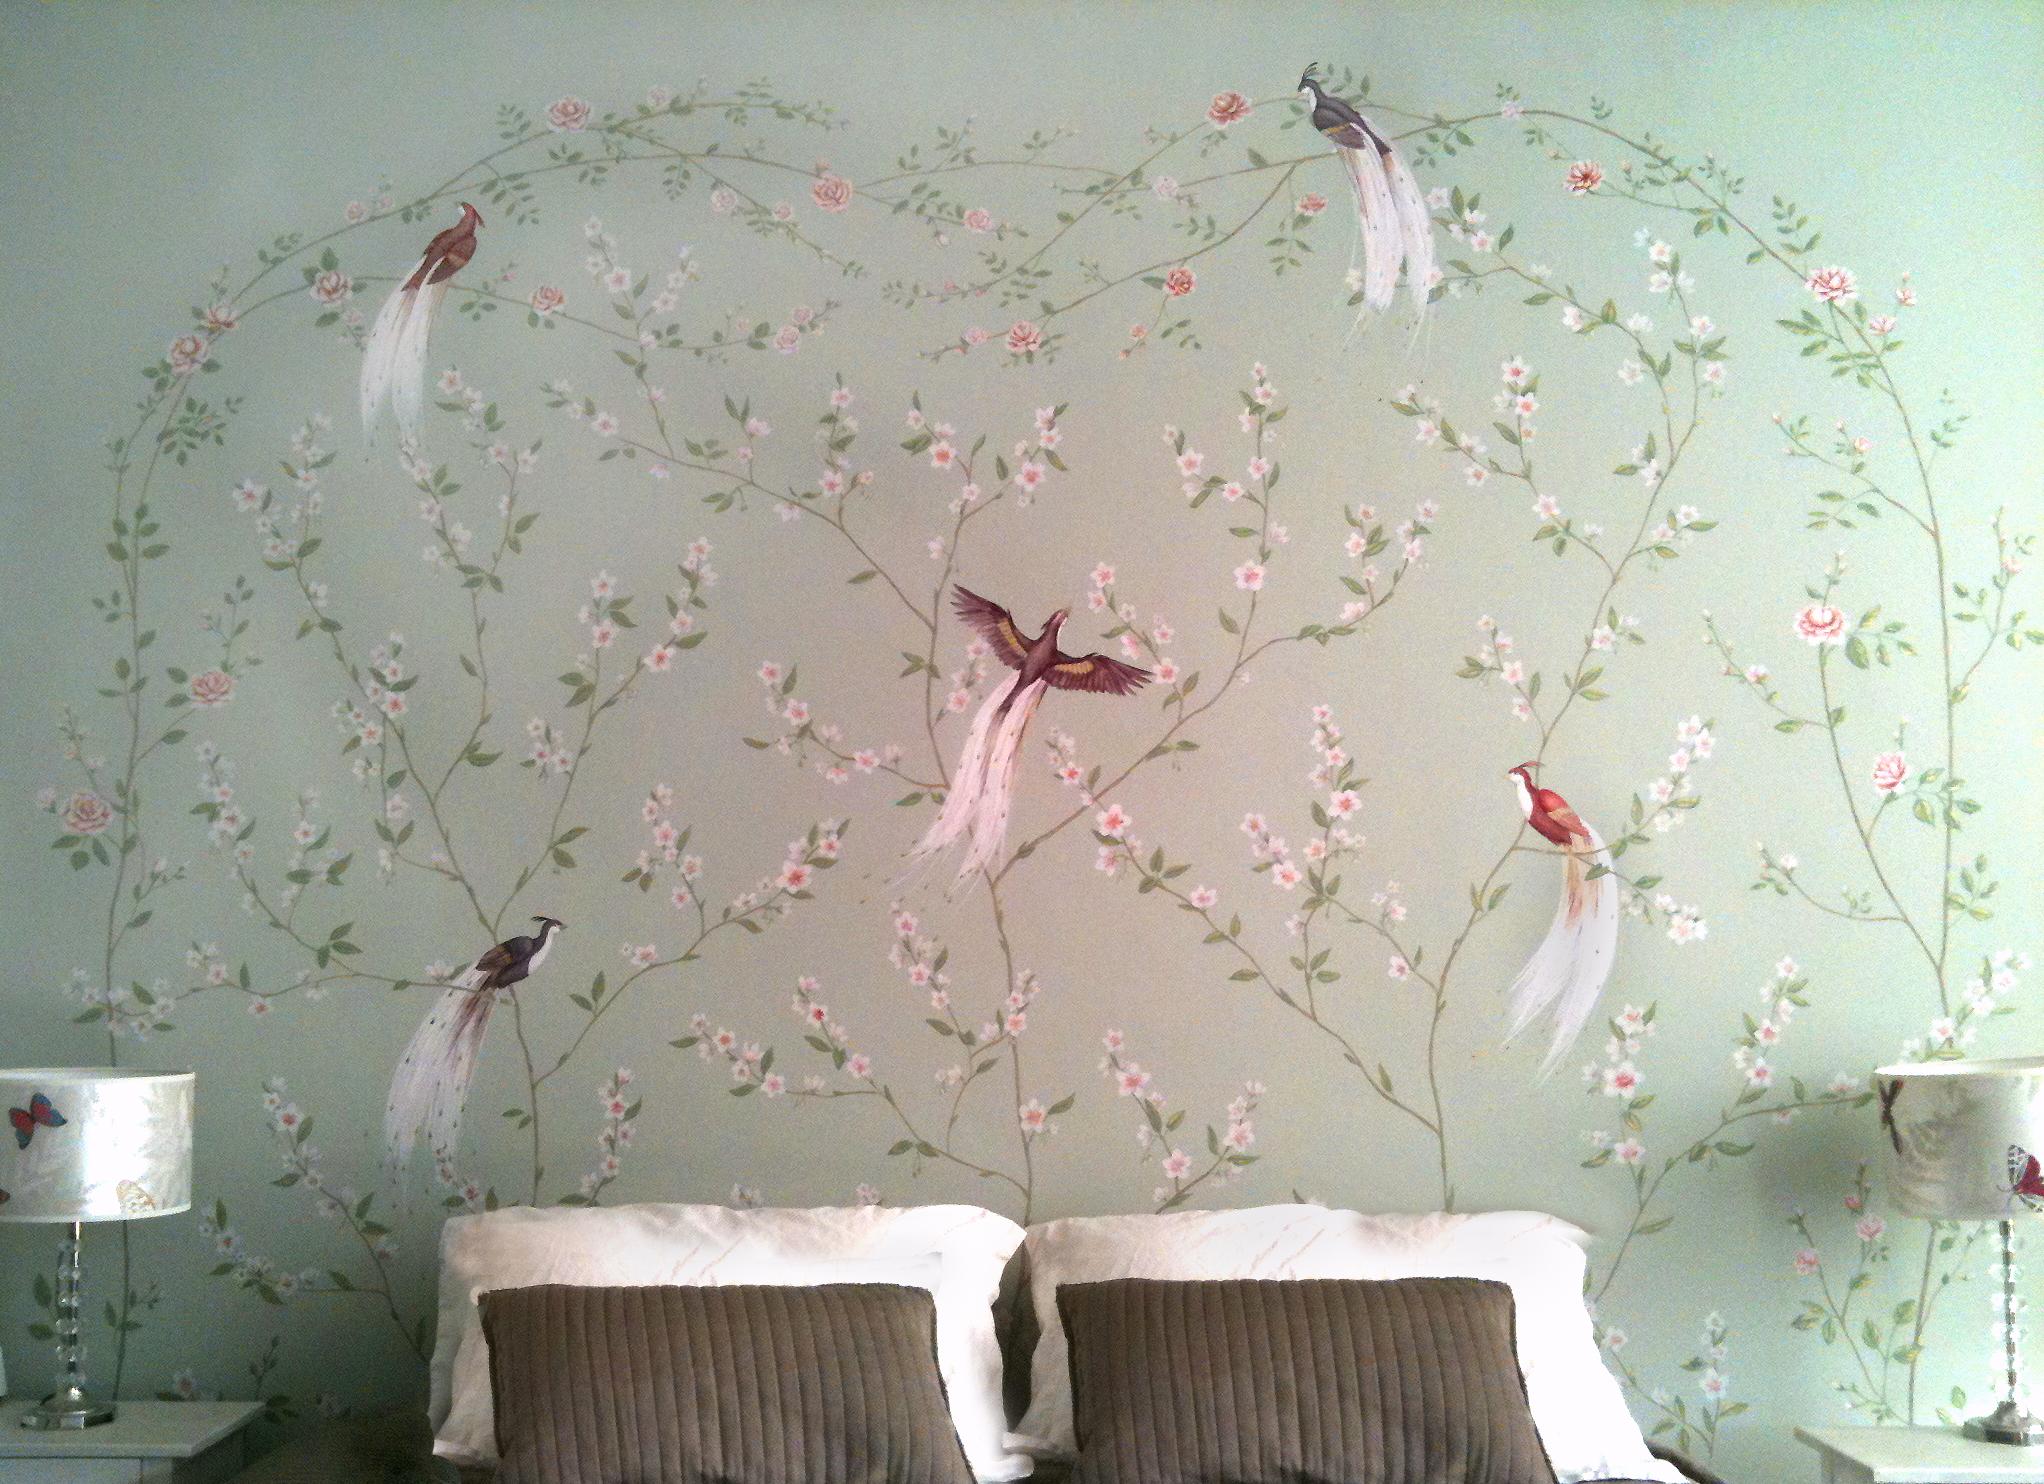 BIRD OF PARADISE HEADBOARD